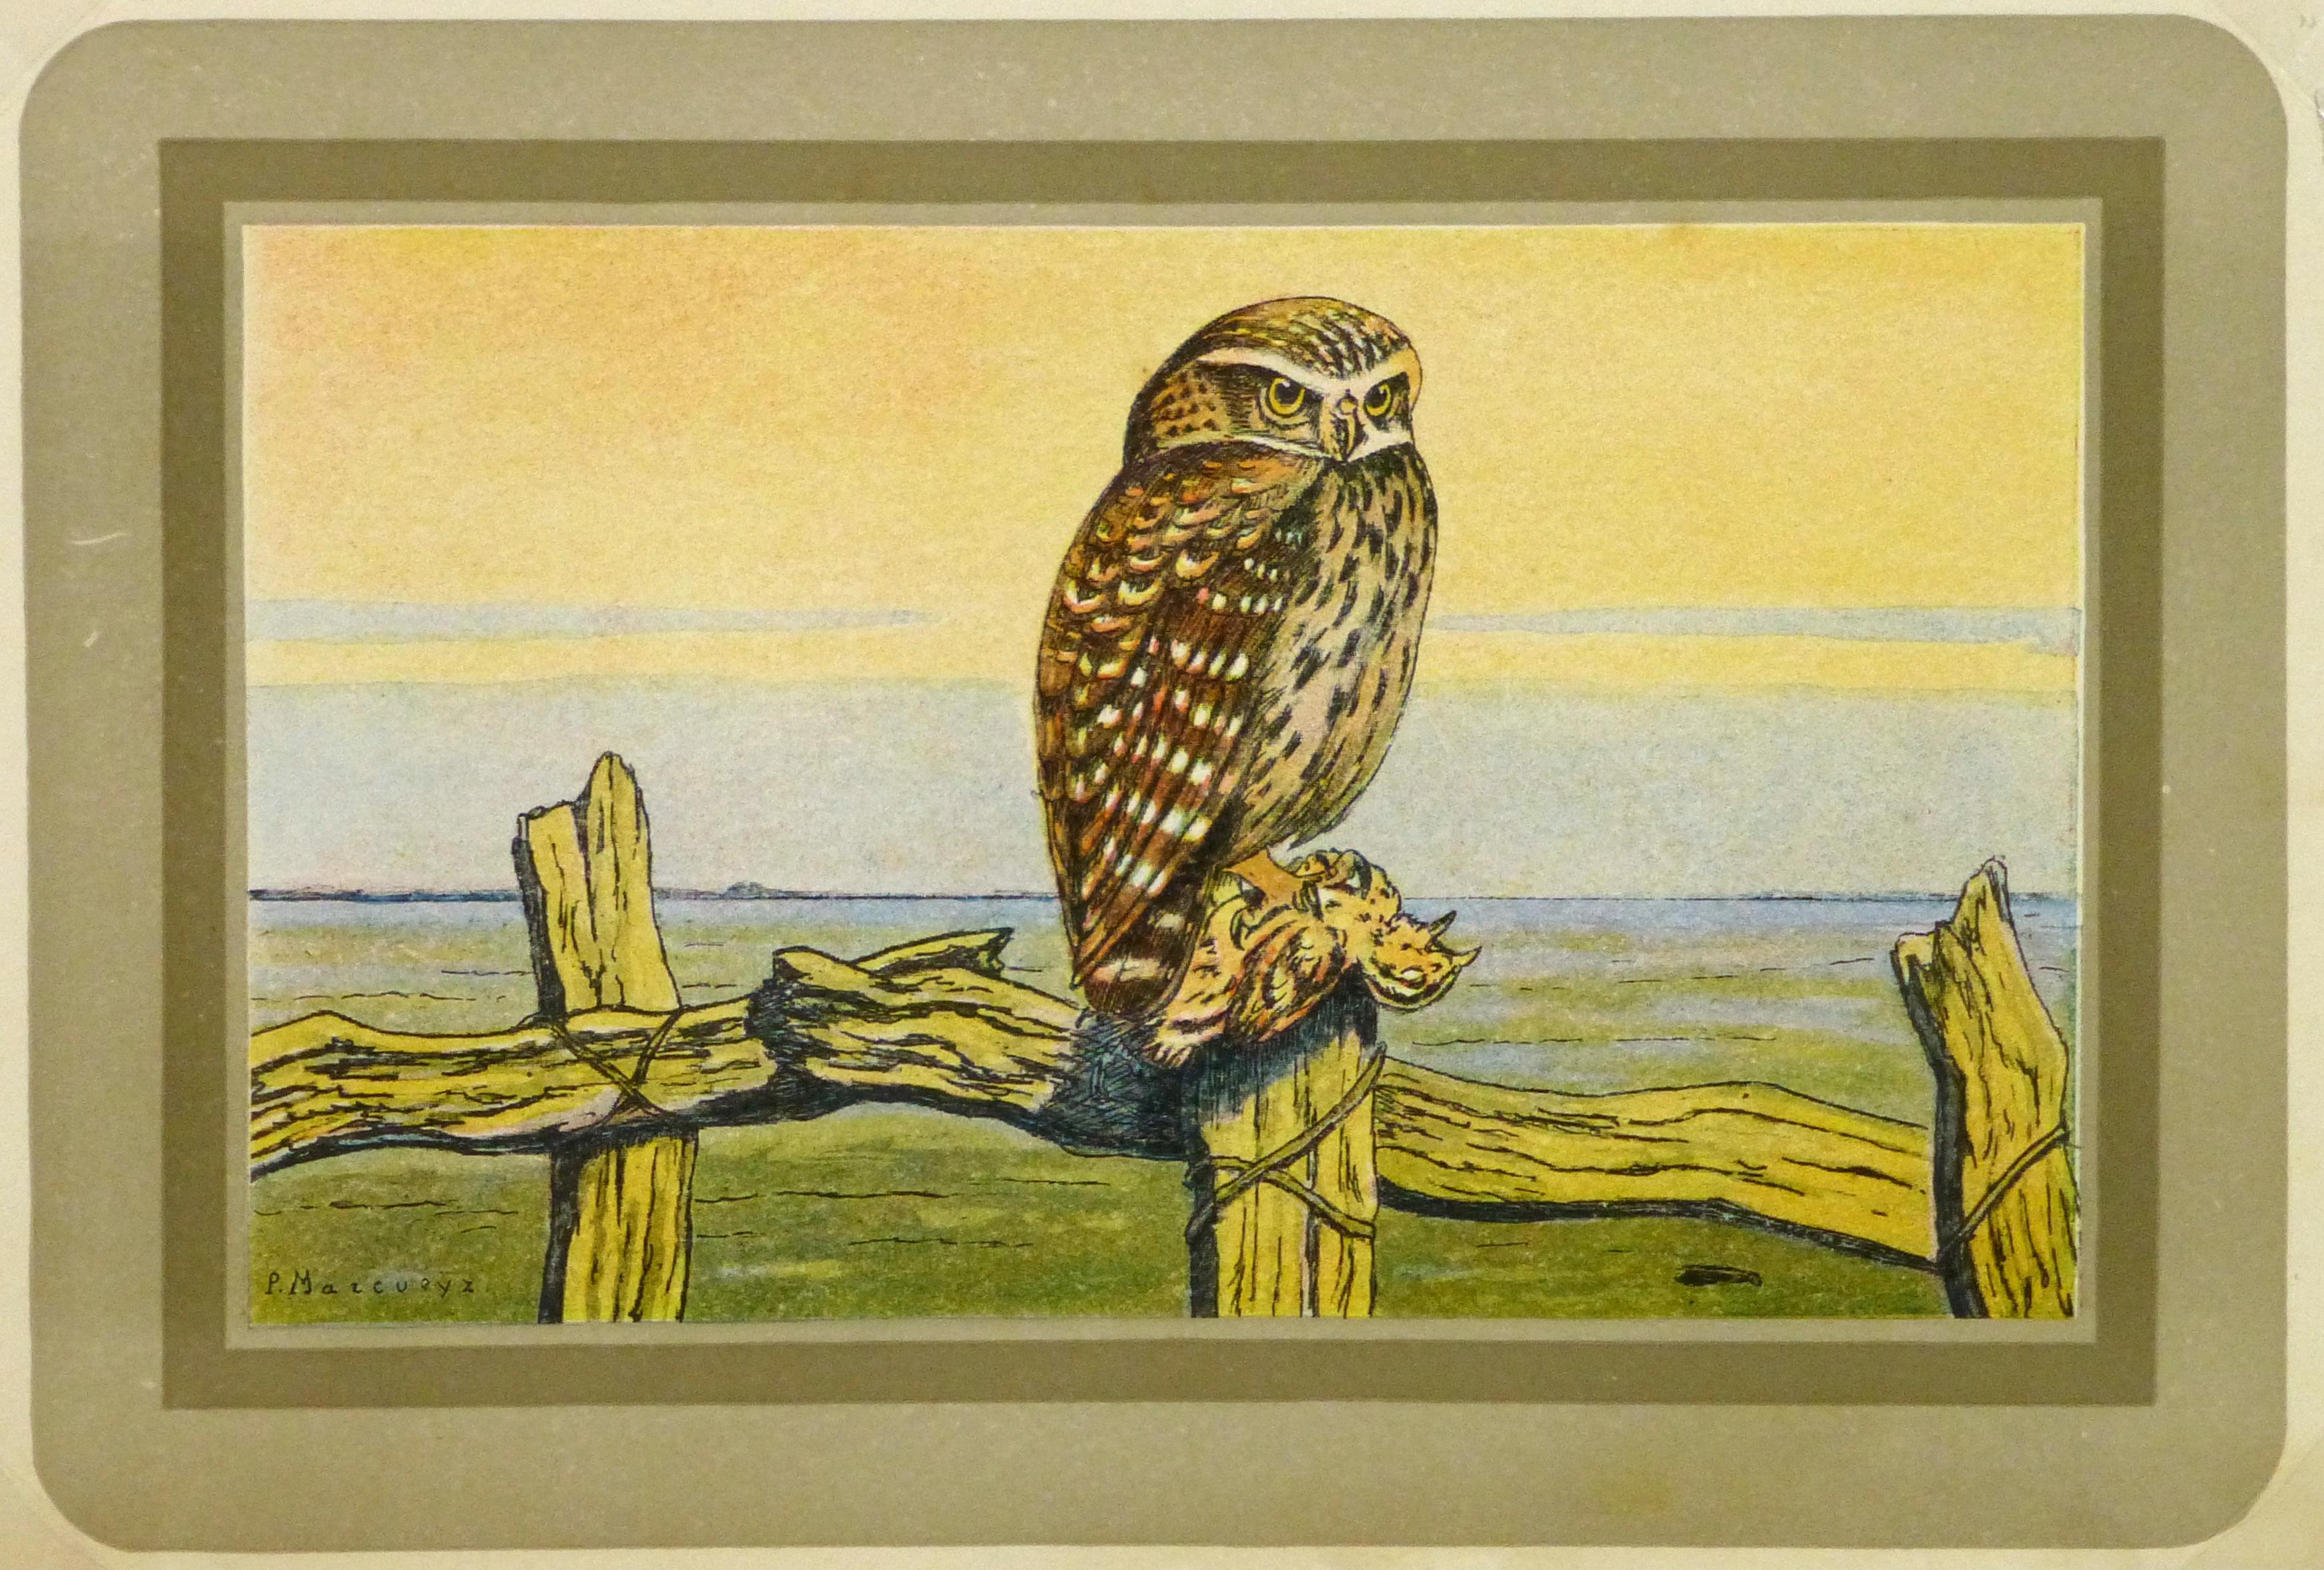 Burrowing Owl Print, Circa 1920-main-9213K